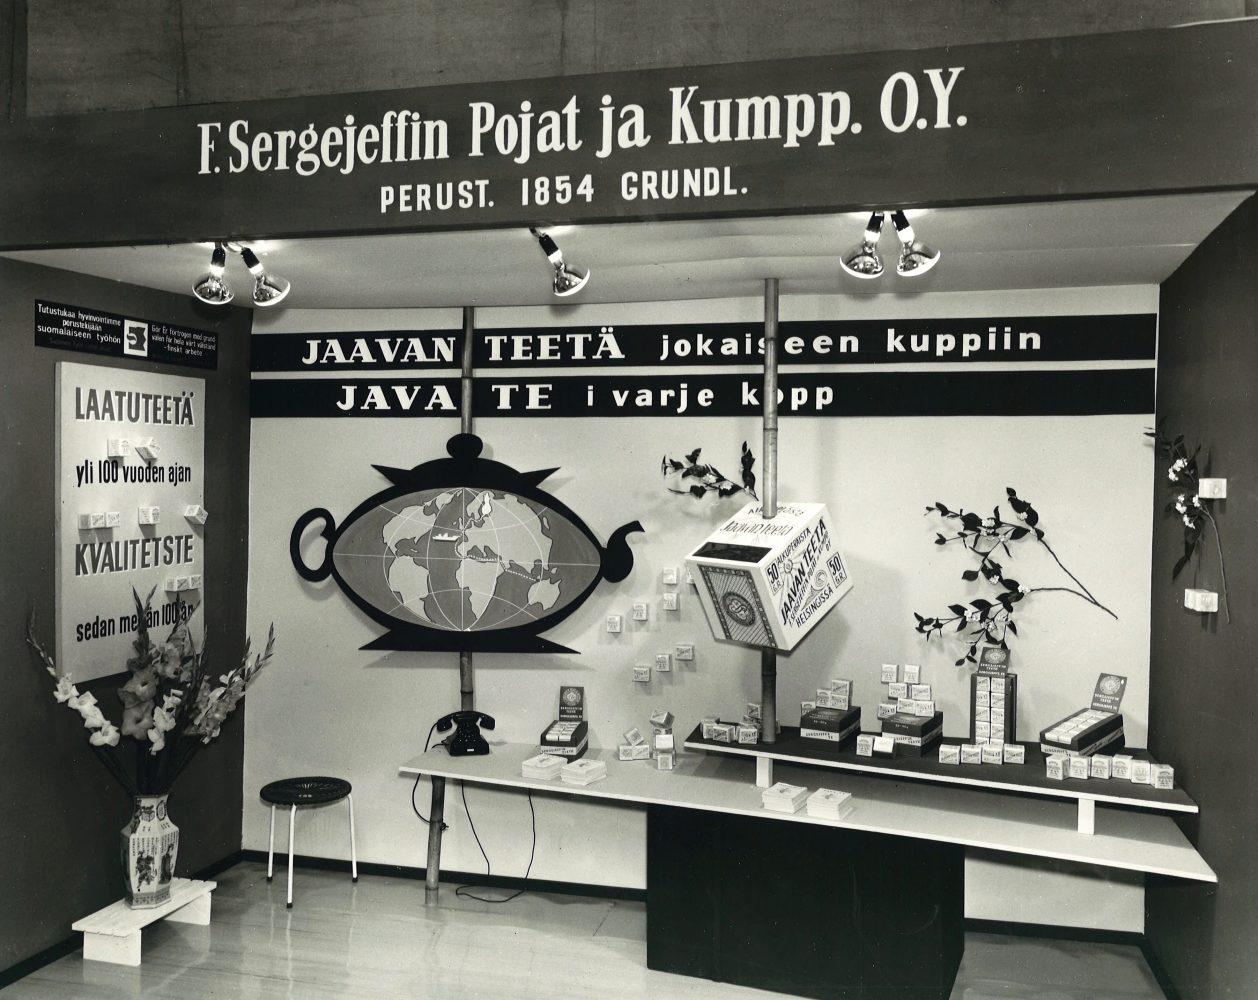 Messukuva vuodelta 1962